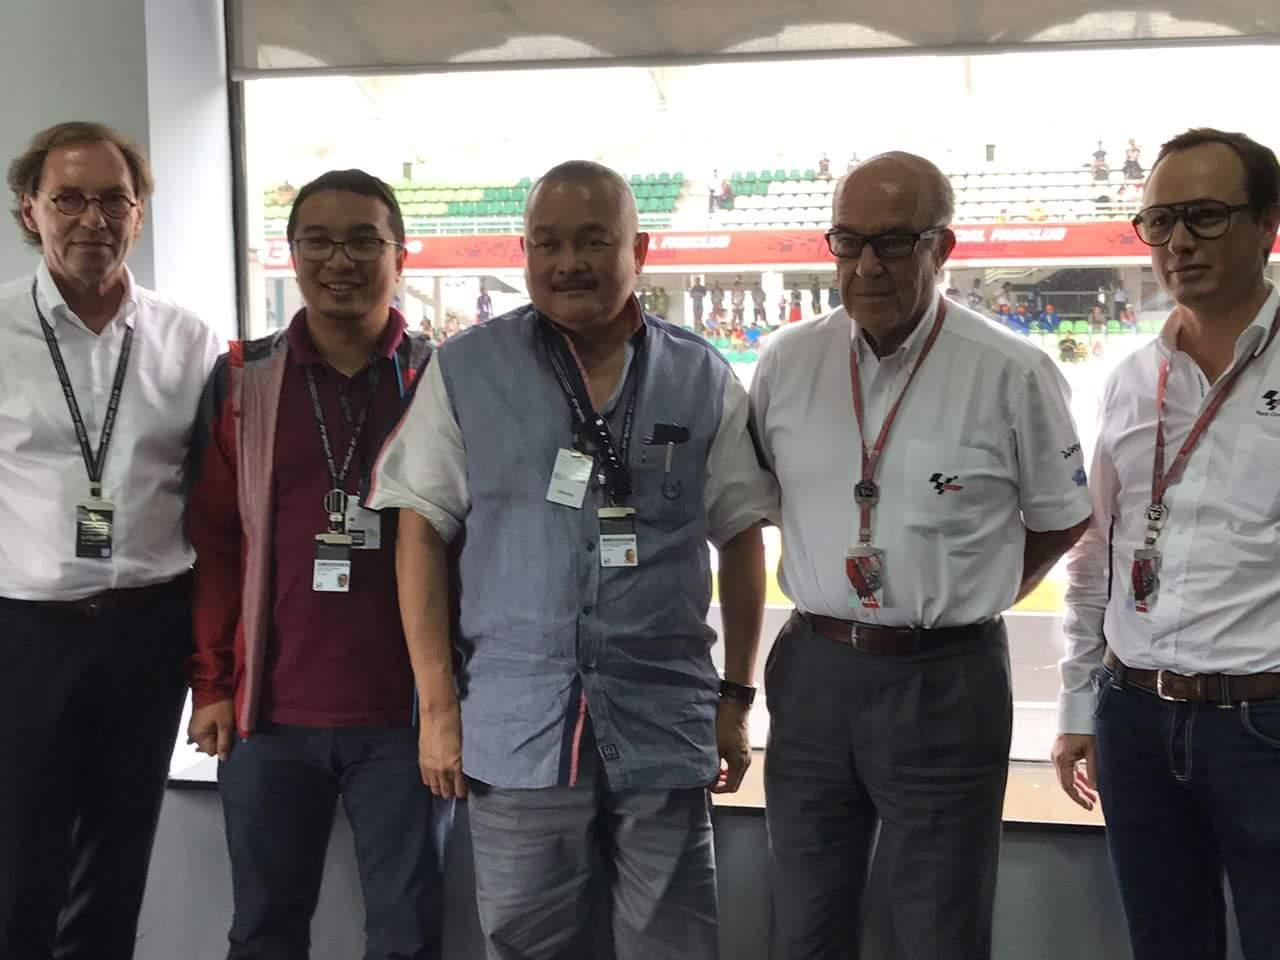 alex-nurdin-ketemu-pihak-dorna-di-sepang-malaysia-tanggal-29-oktober-2016